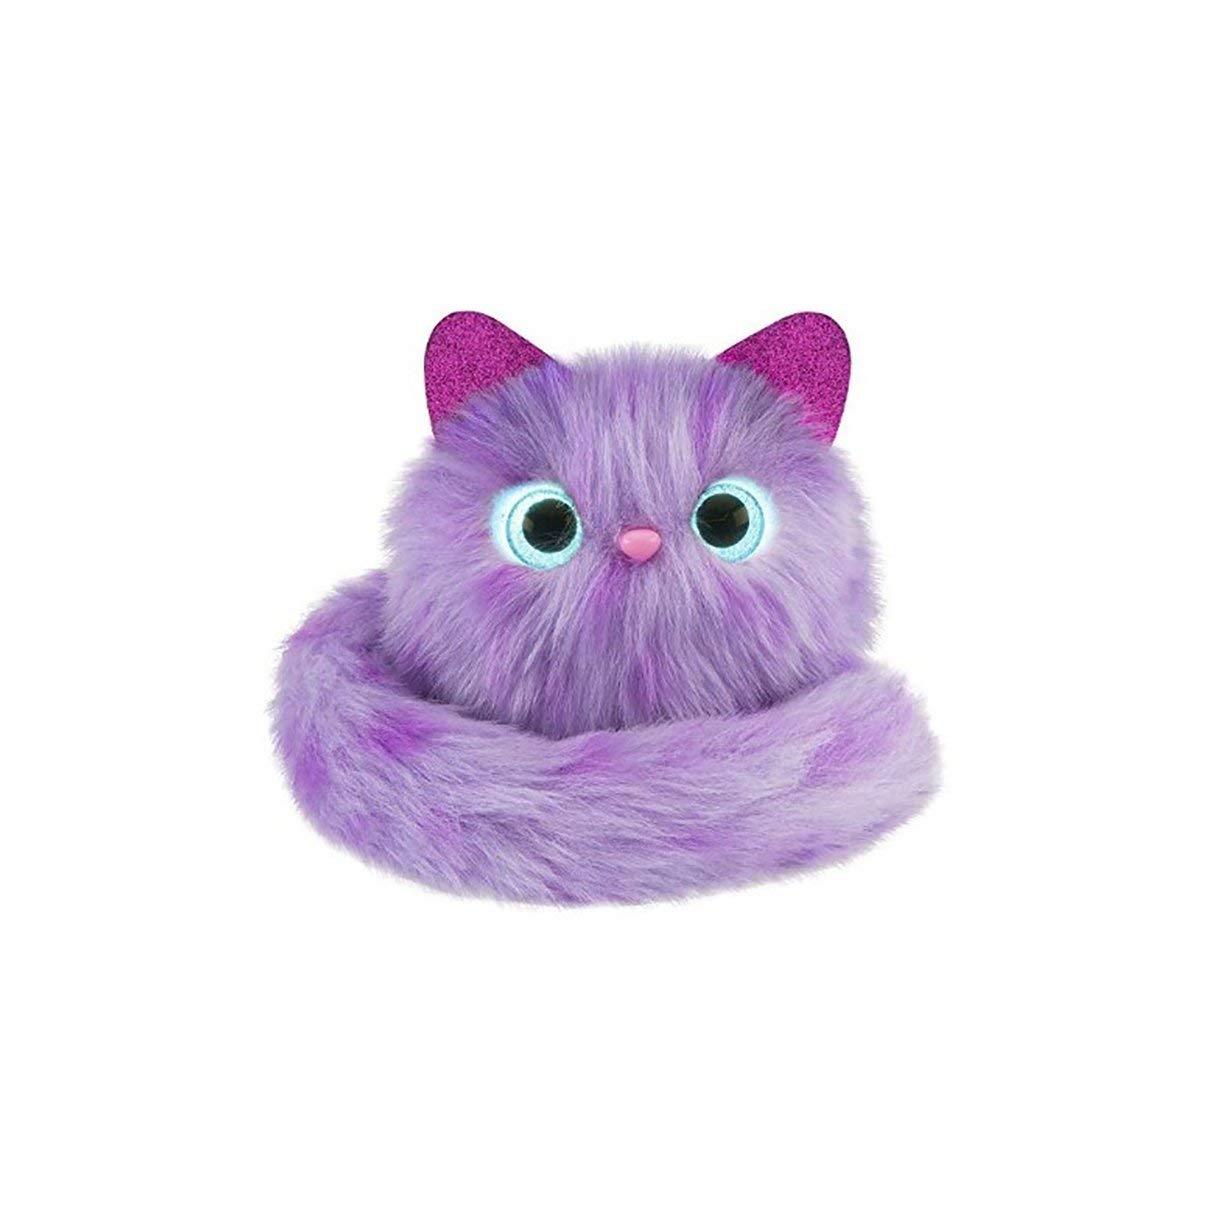 Surprise Pomsies Cat Plush Interactive Toys Pomsies Cute Funny Toys For Children Triamisucake